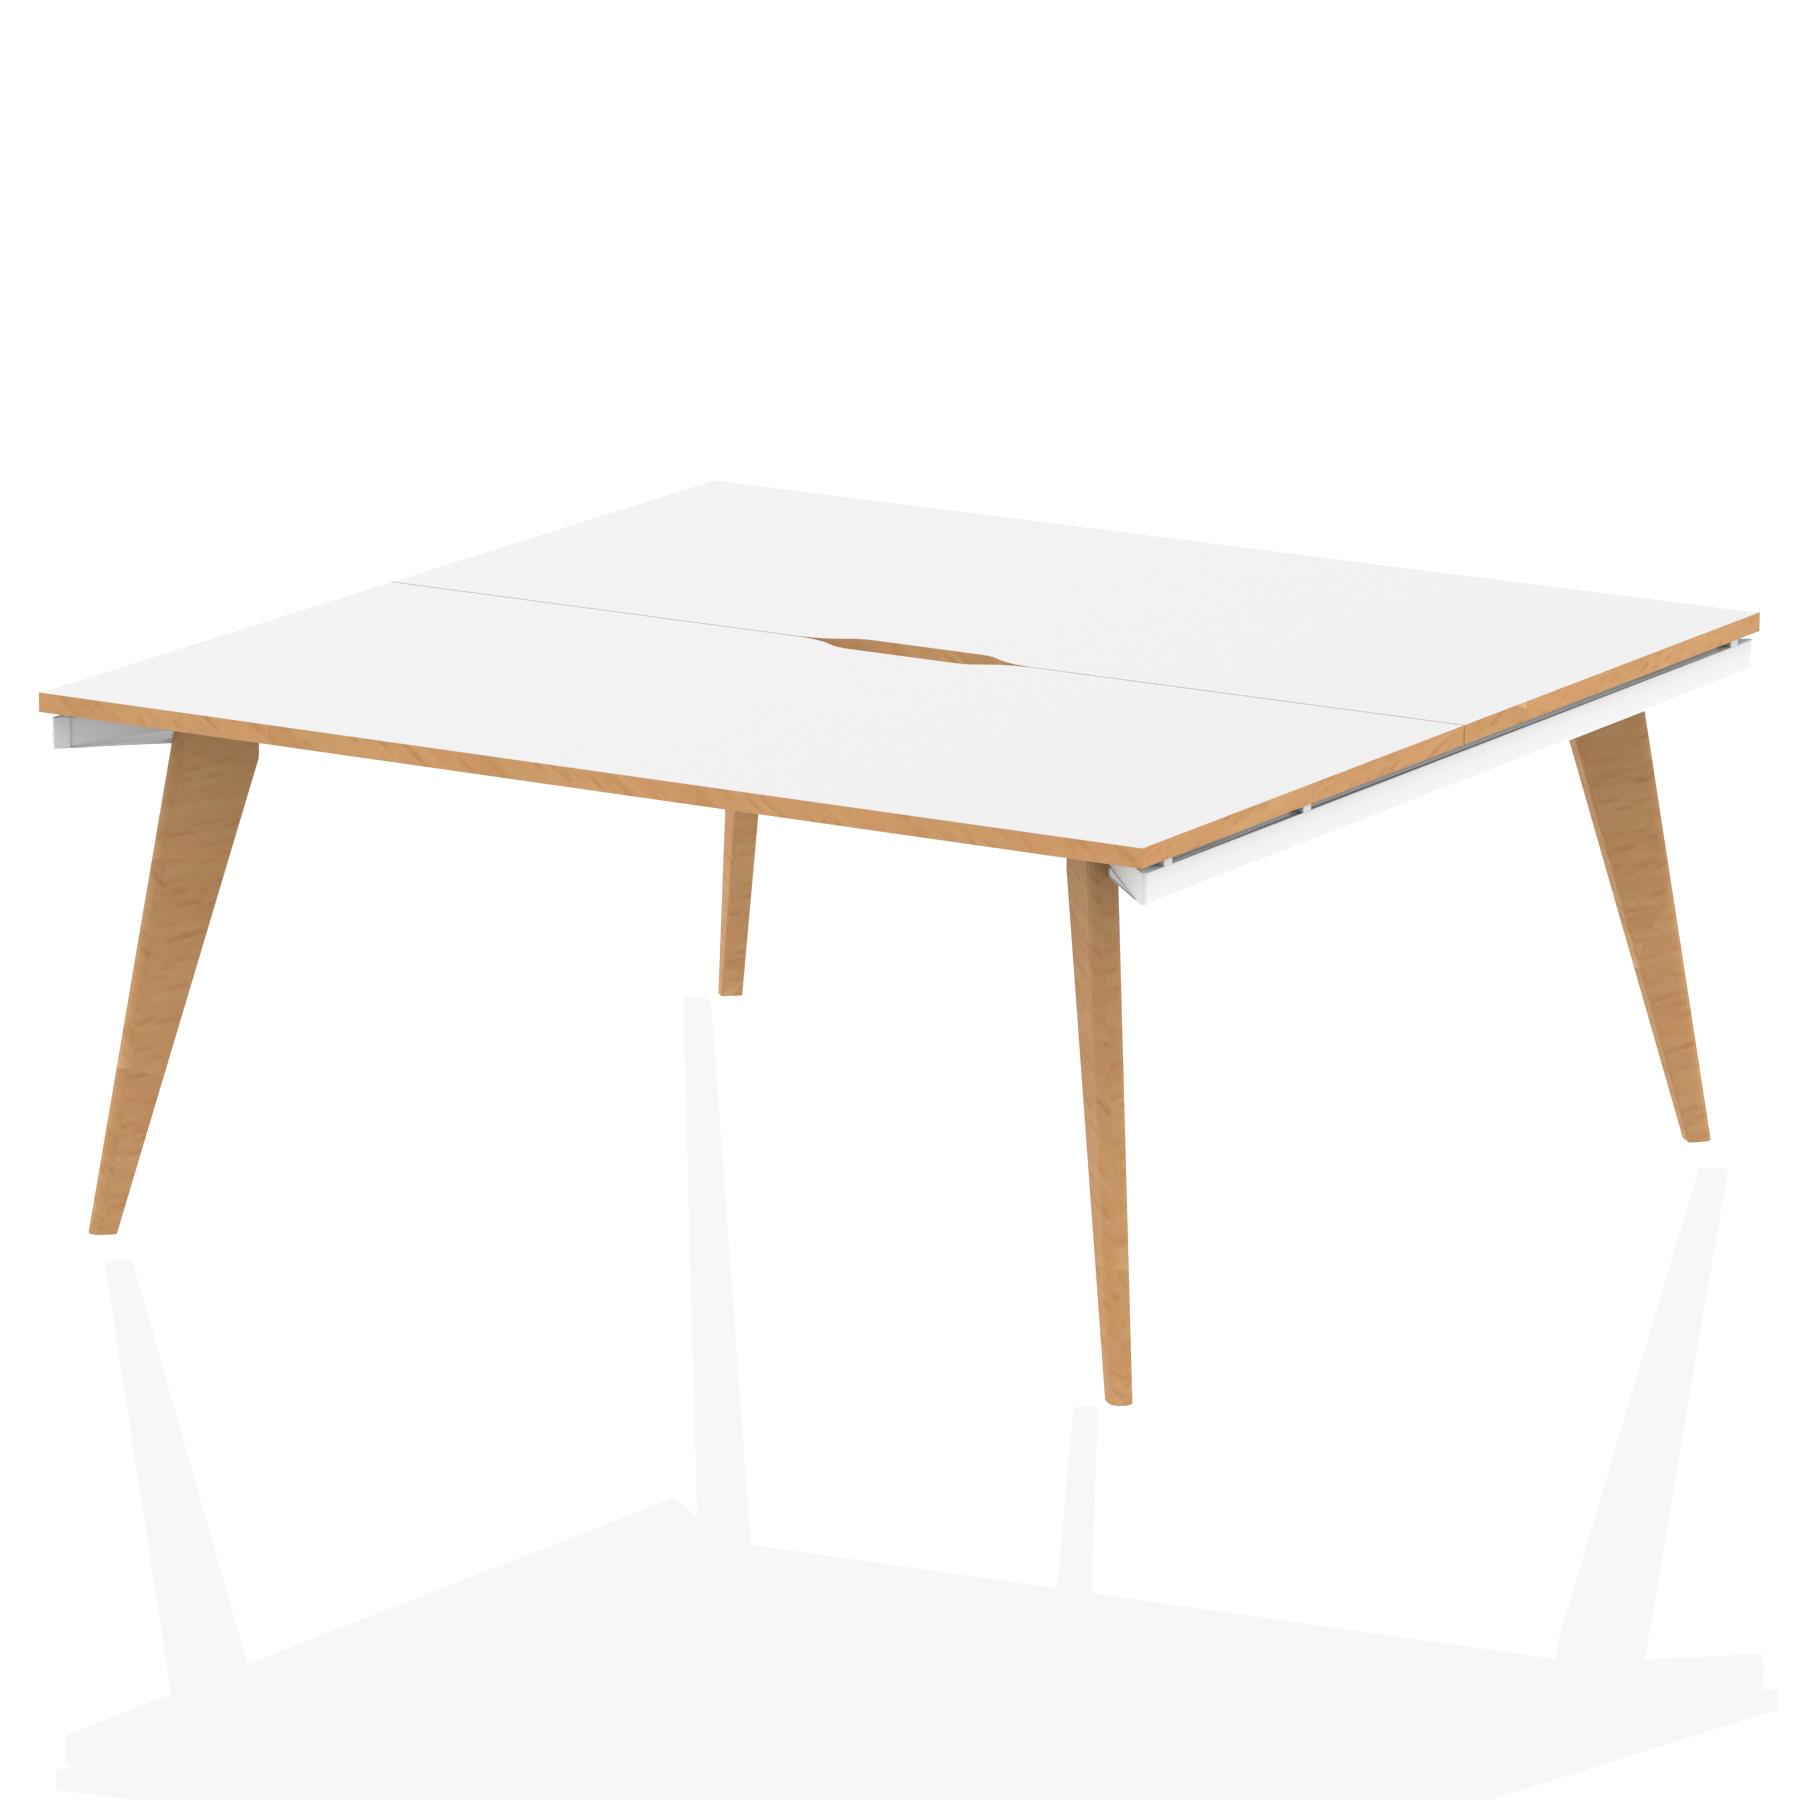 Oslo B2B White Frame Wooden Leg Bench Desk 1600 White With Natural Wood Edge (2 Pod)